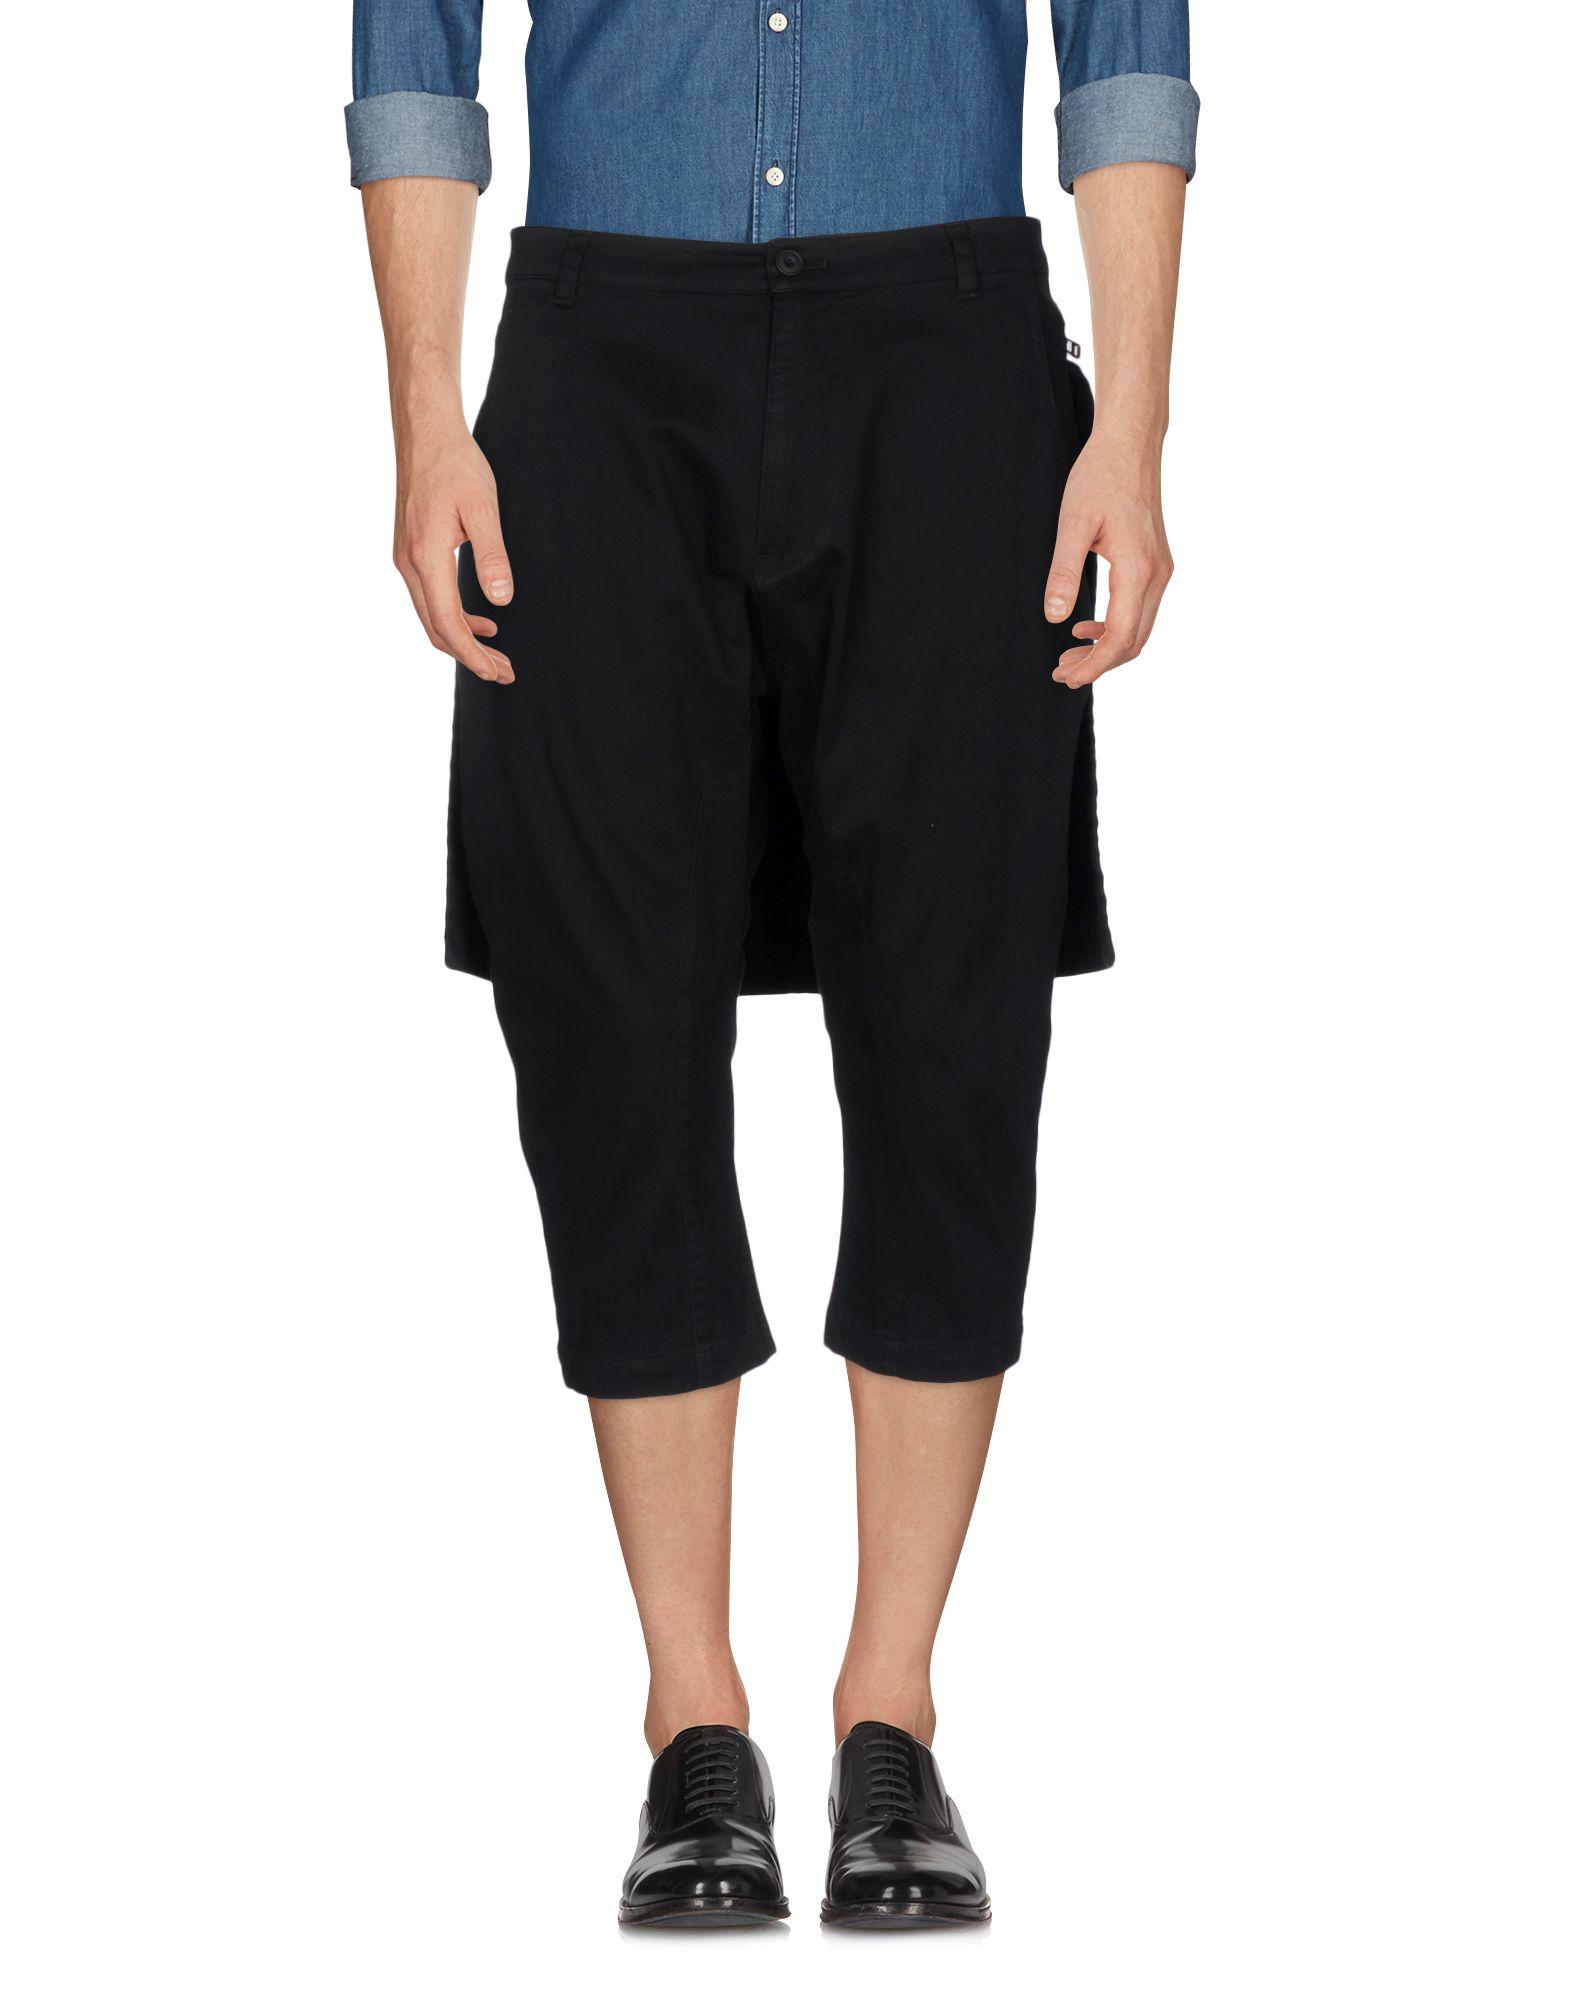 Pantalone Capri Helmut Lang Uomo - Acquista online su